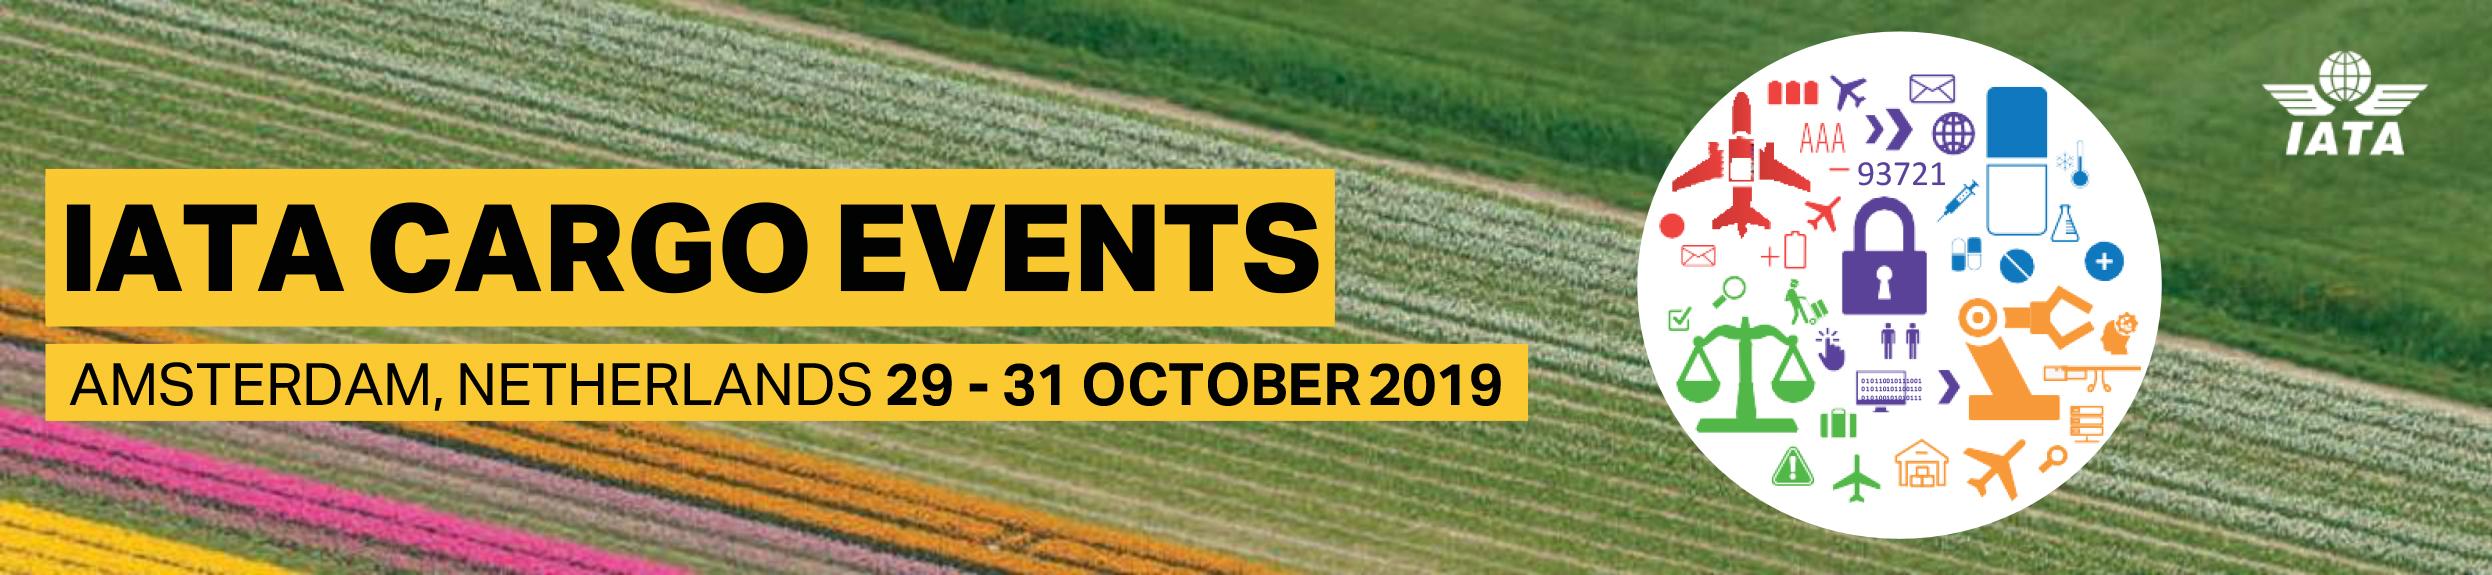 IATA Cargo Events 2019